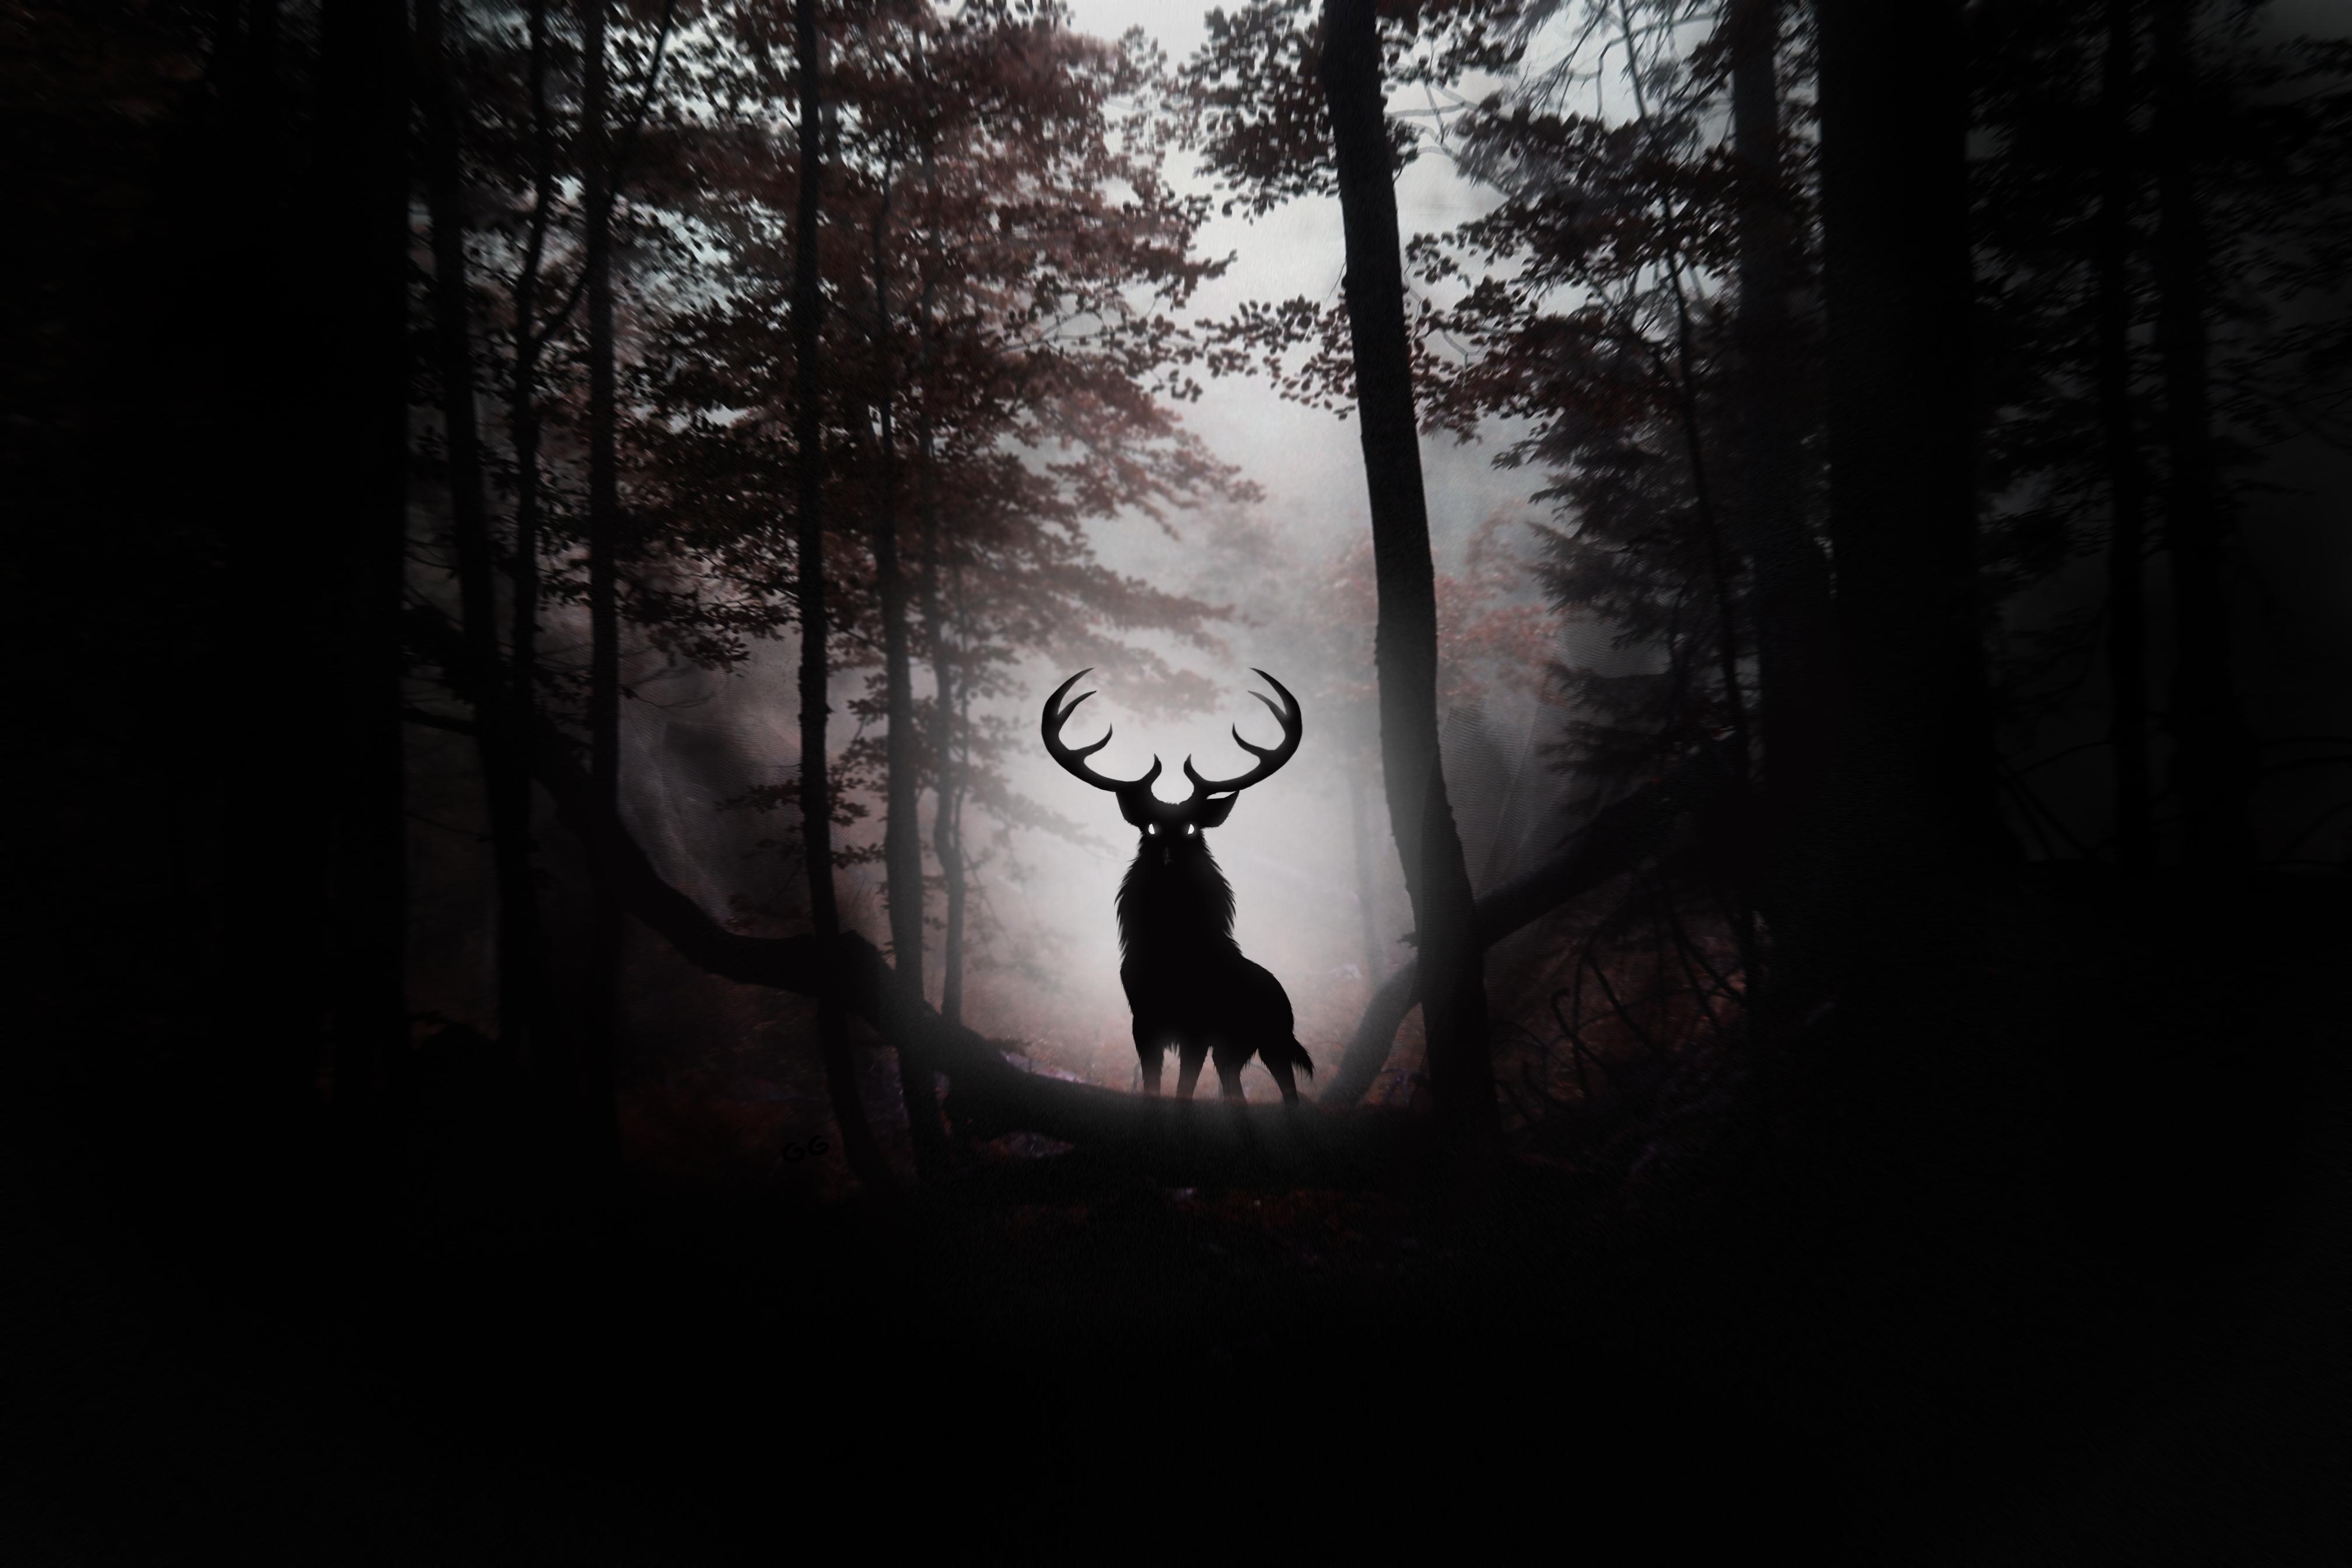 deer fantasy artwork 4k hd artist 4k wallpapers images